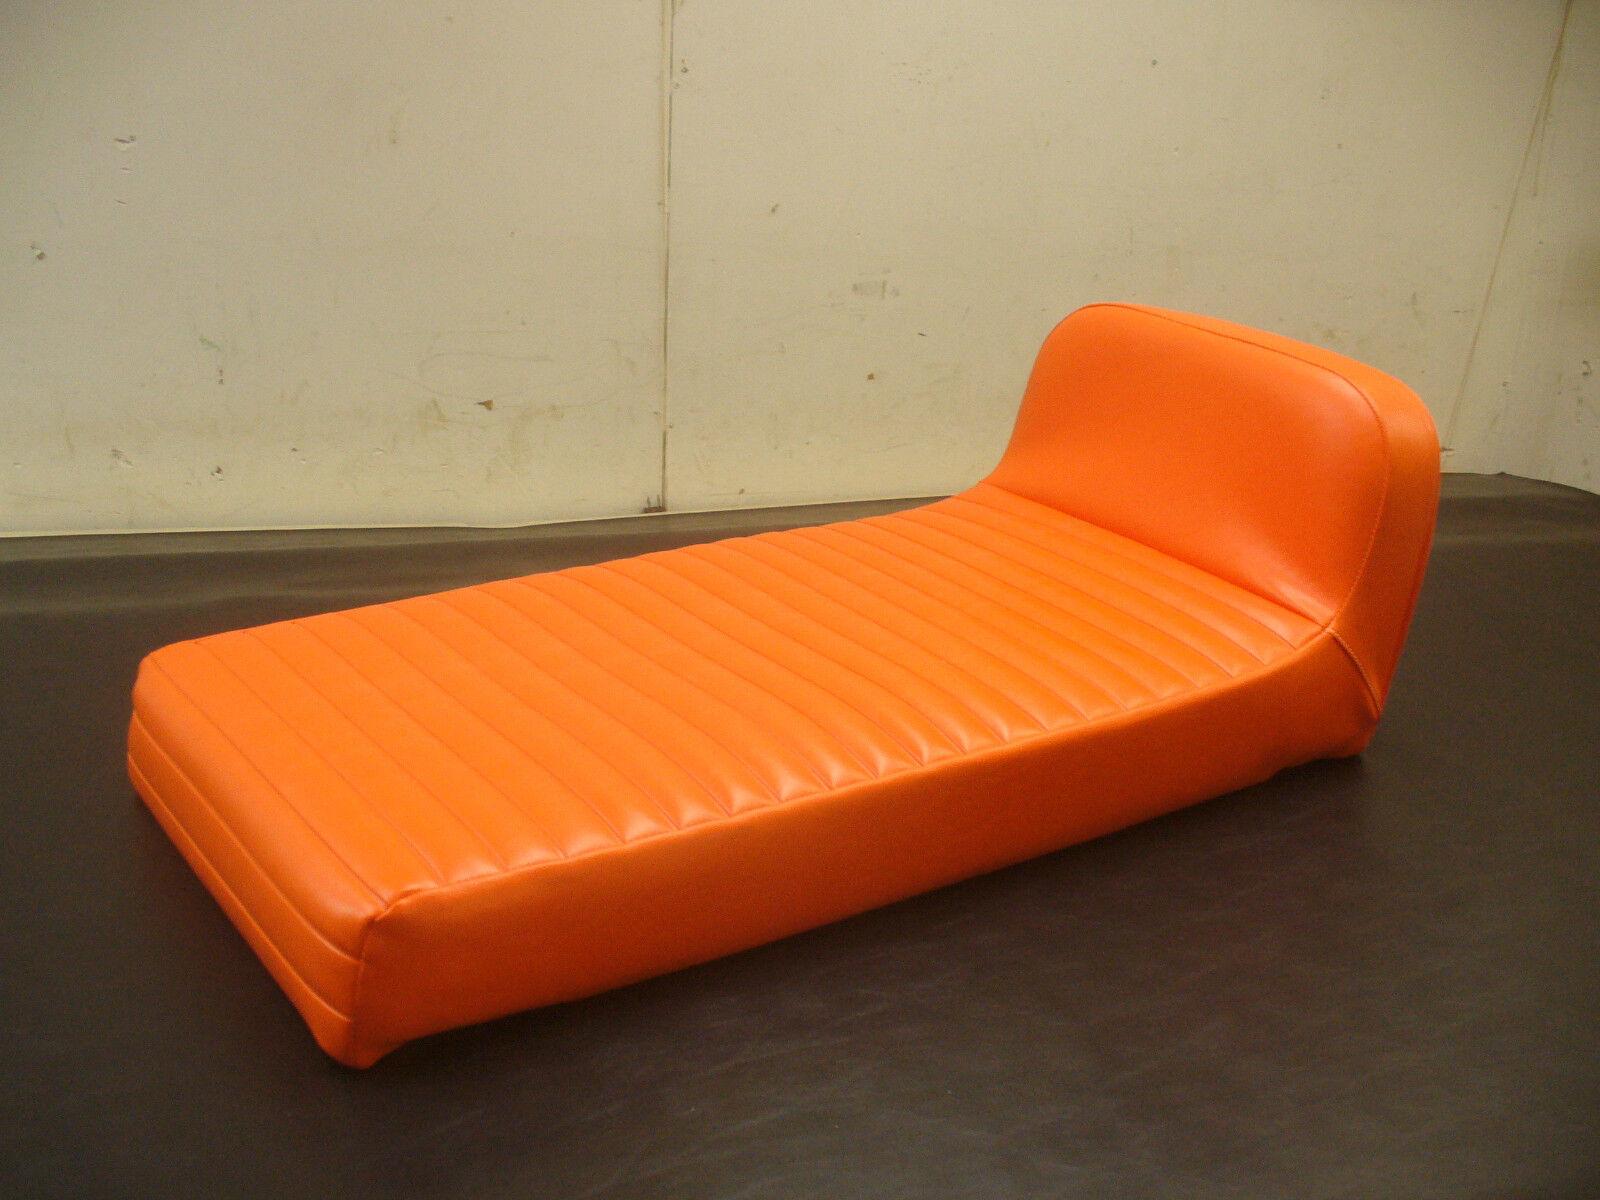 1969-1971 JOHNSON SKEEHORSE  orange PLEAT SNOWMOBILE SEAT COVER   NEW